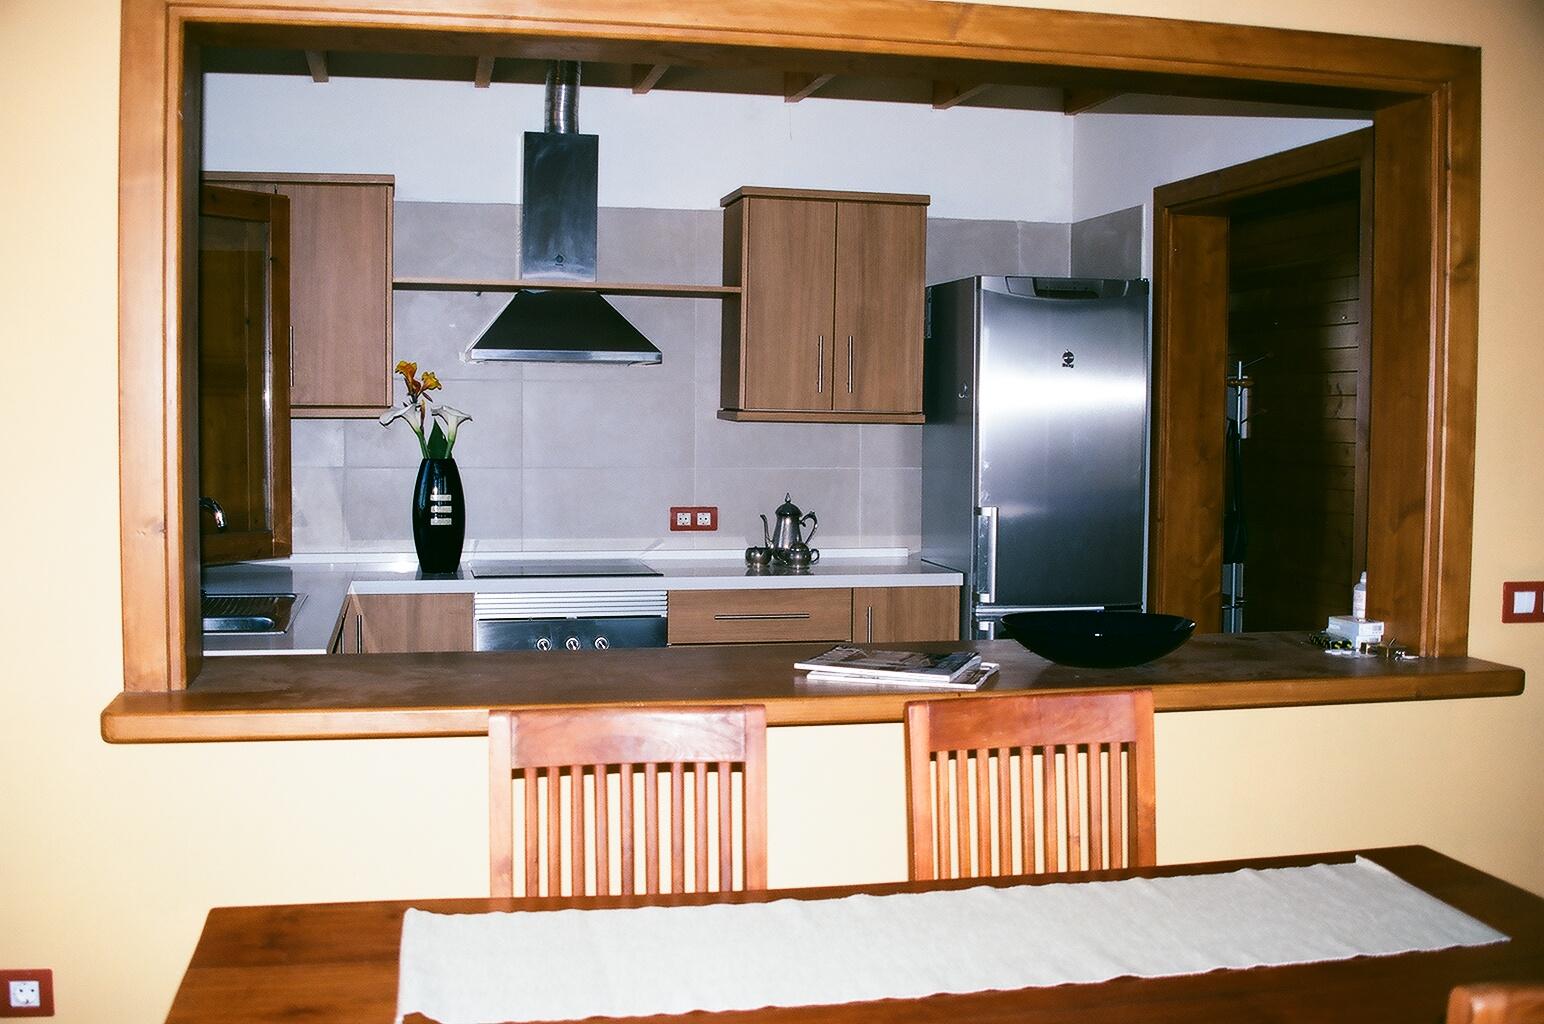 Vivienda unifamiliar centro valle - Pasaplatos cocina ...